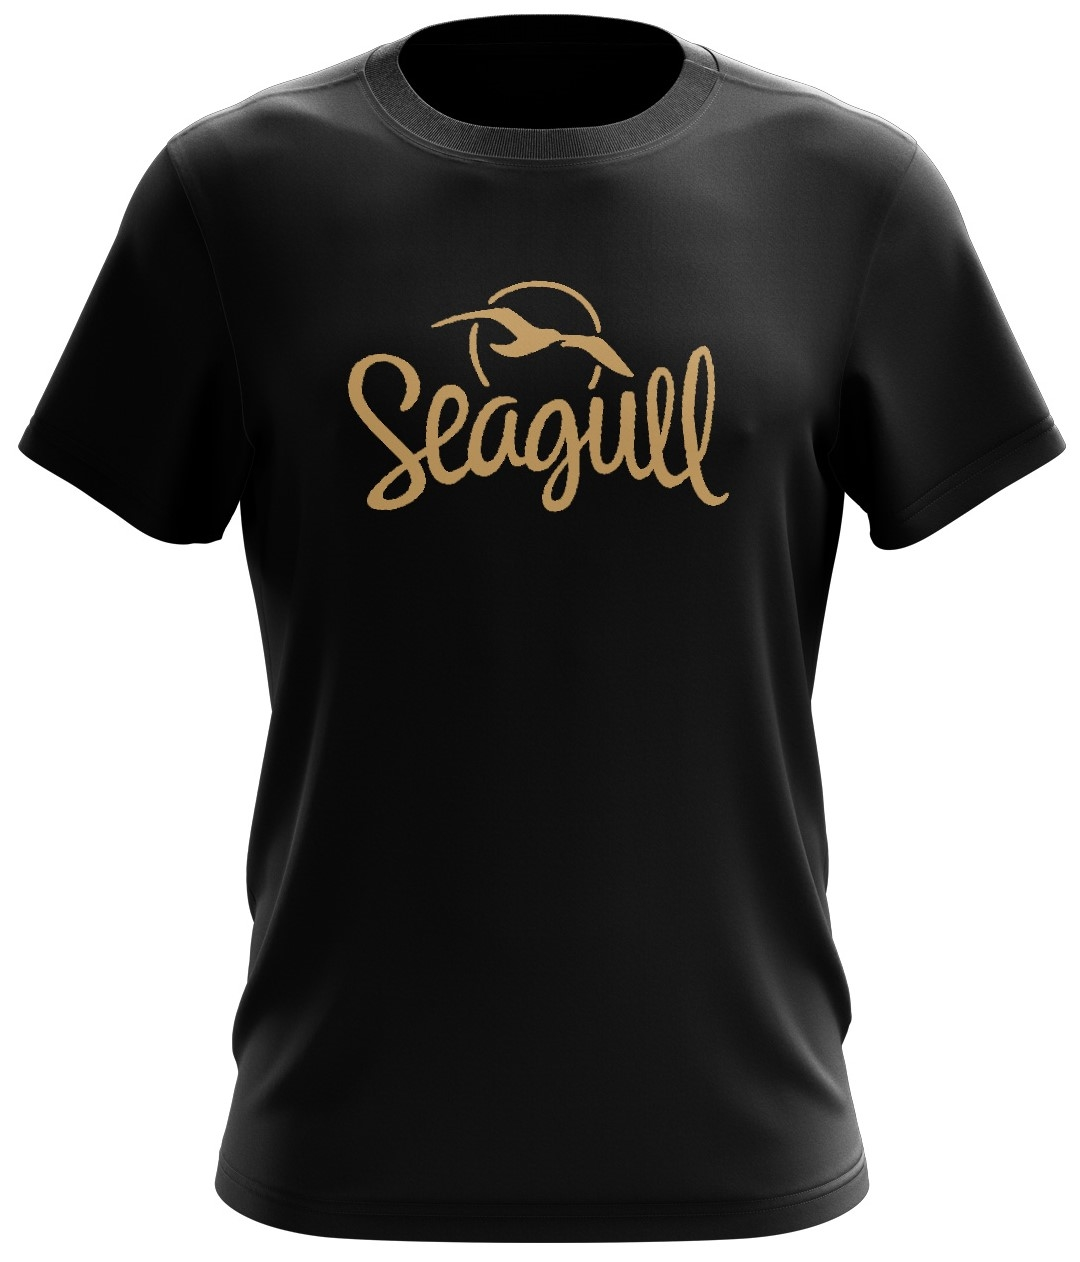 SEAGULL Logo T-Shirt Black XL